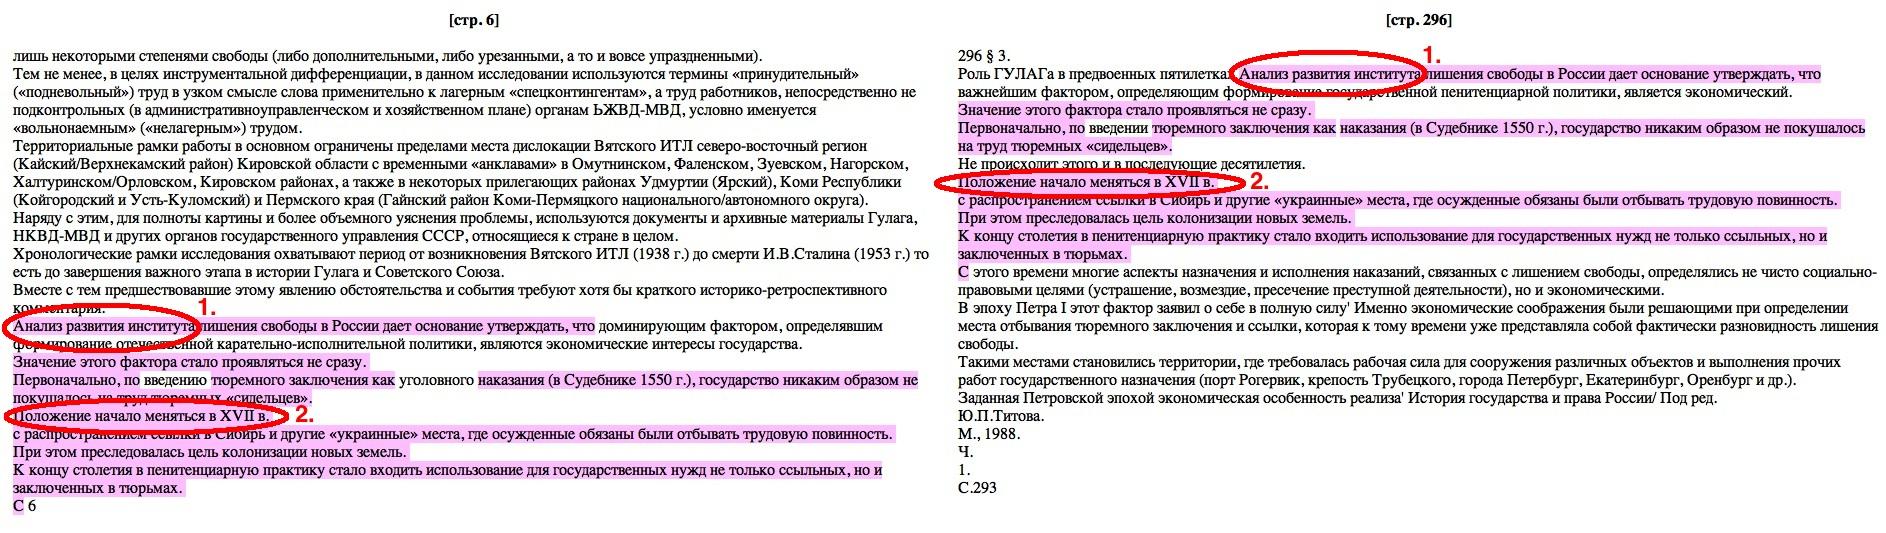 belyk-comp6-rassk2